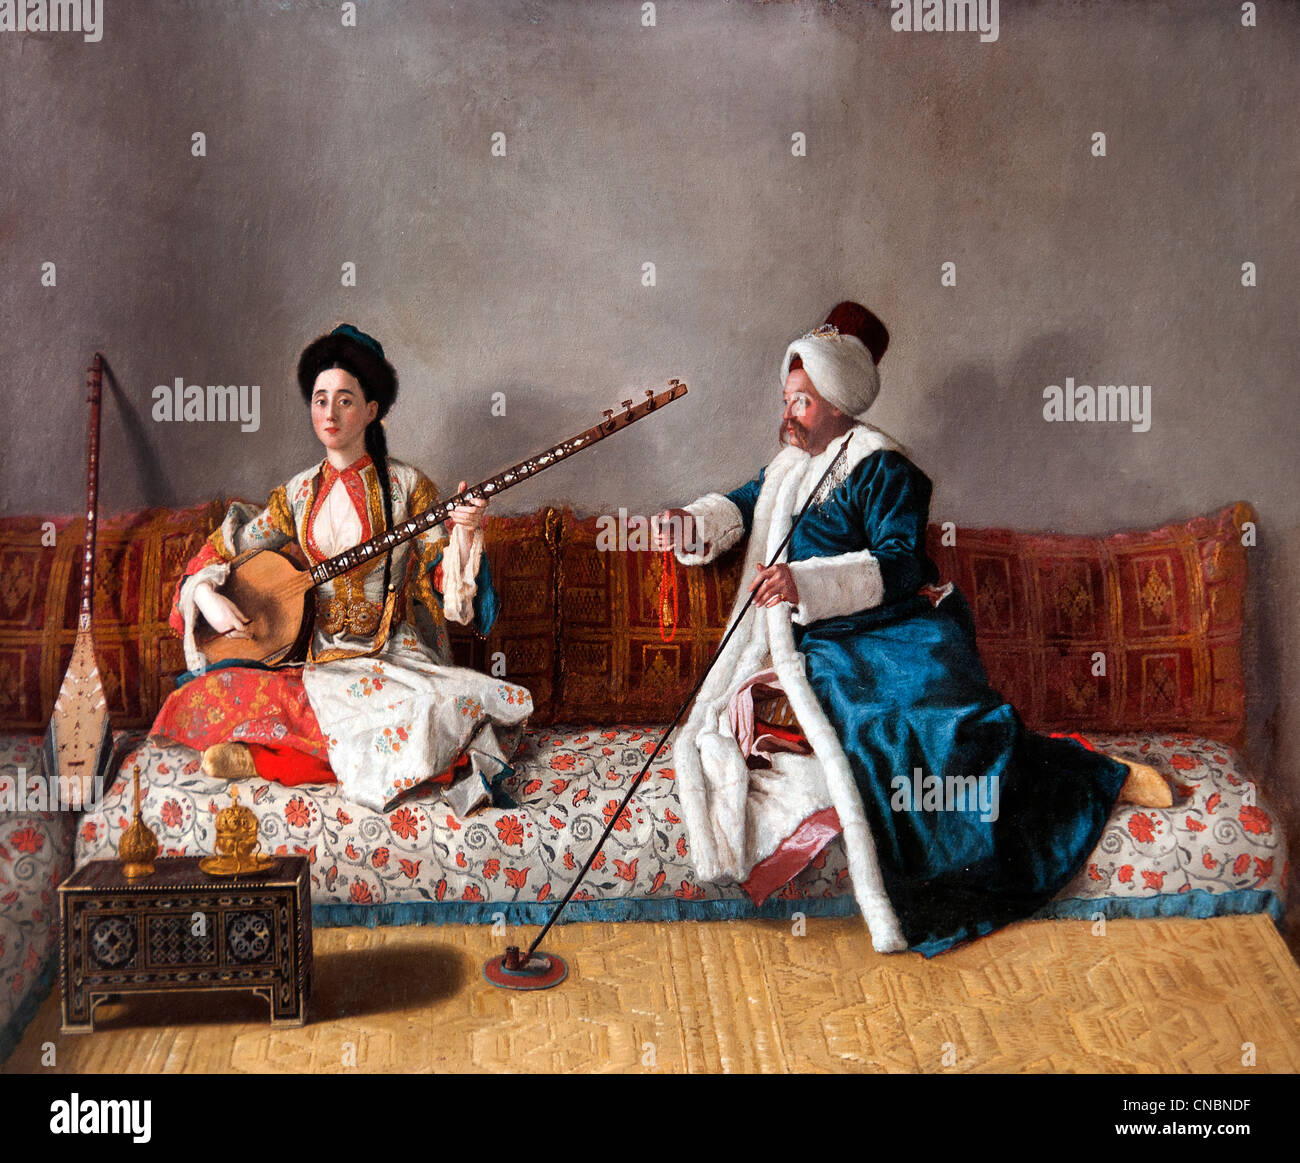 Monsieur Levett e Mademoiselle Glavani in costume turco Svizzero Francese Jean-Etienne Liotard Costantinopoli Francia Immagini Stock